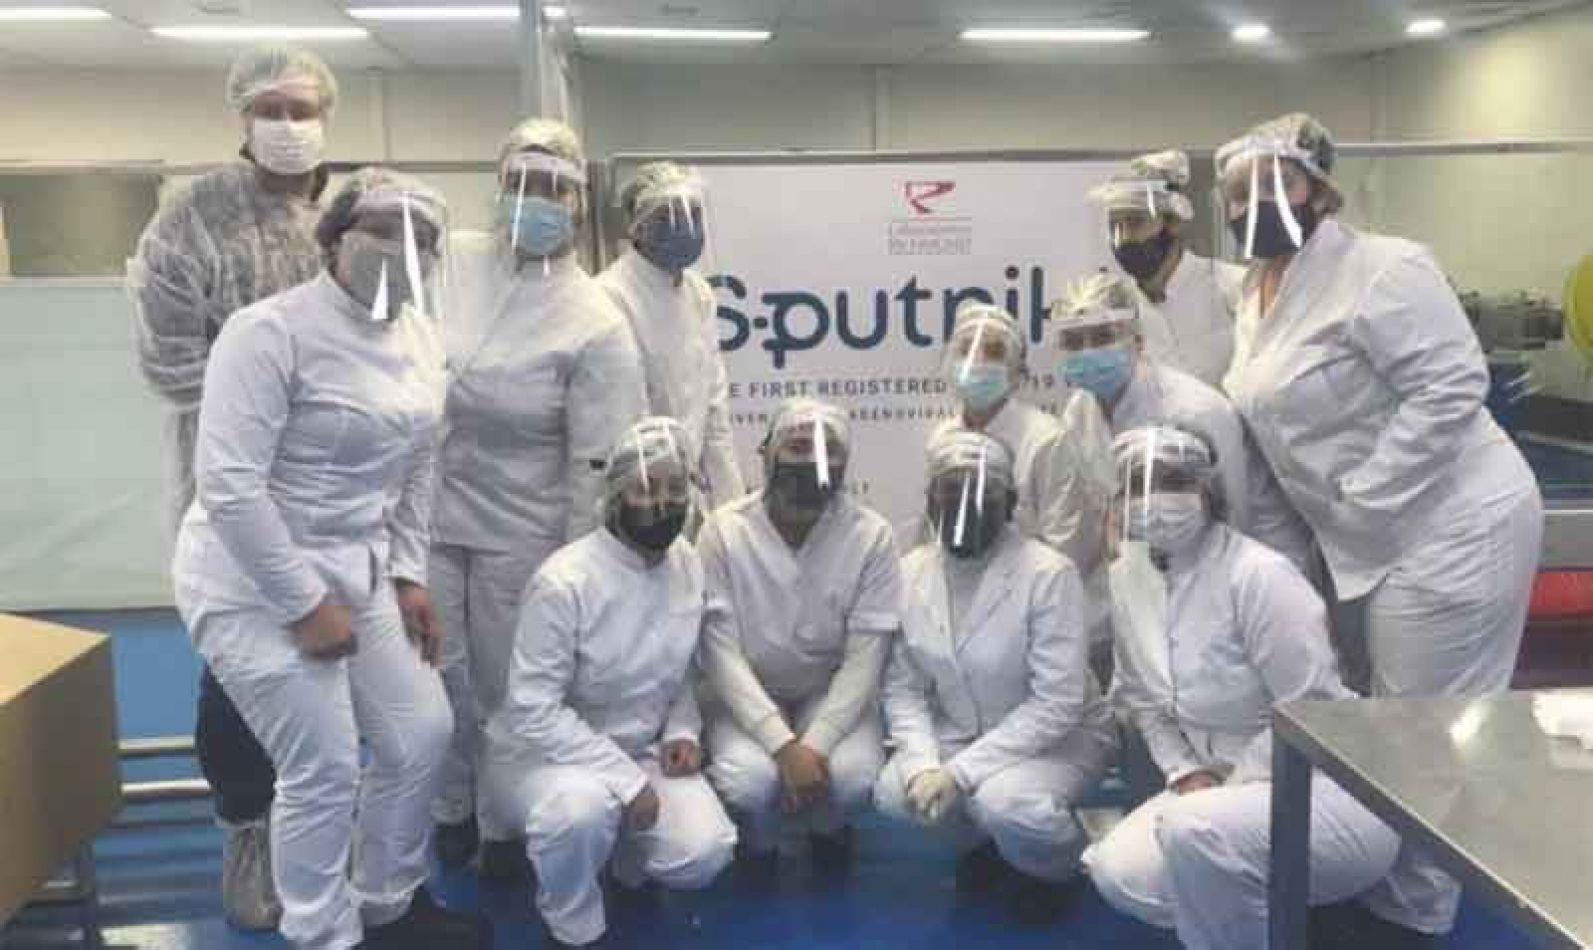 Laboratorios Richmond producirá 3 millones de segundas dosis de Sputnik V en agosto